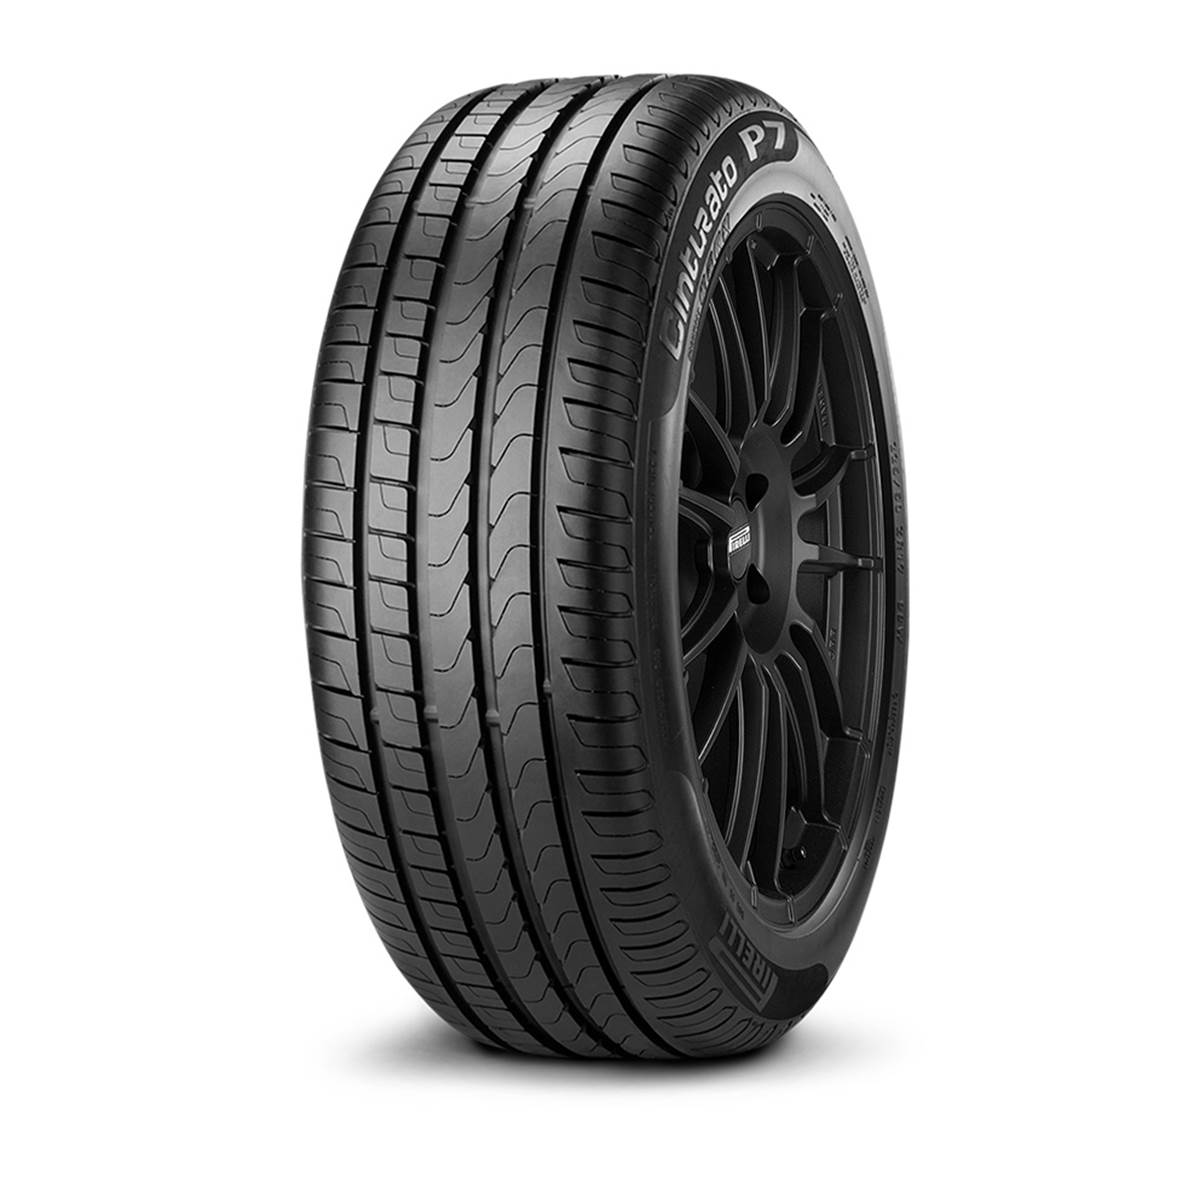 Pneu Pirelli 205/50R17 93W Cinturato P7 XL